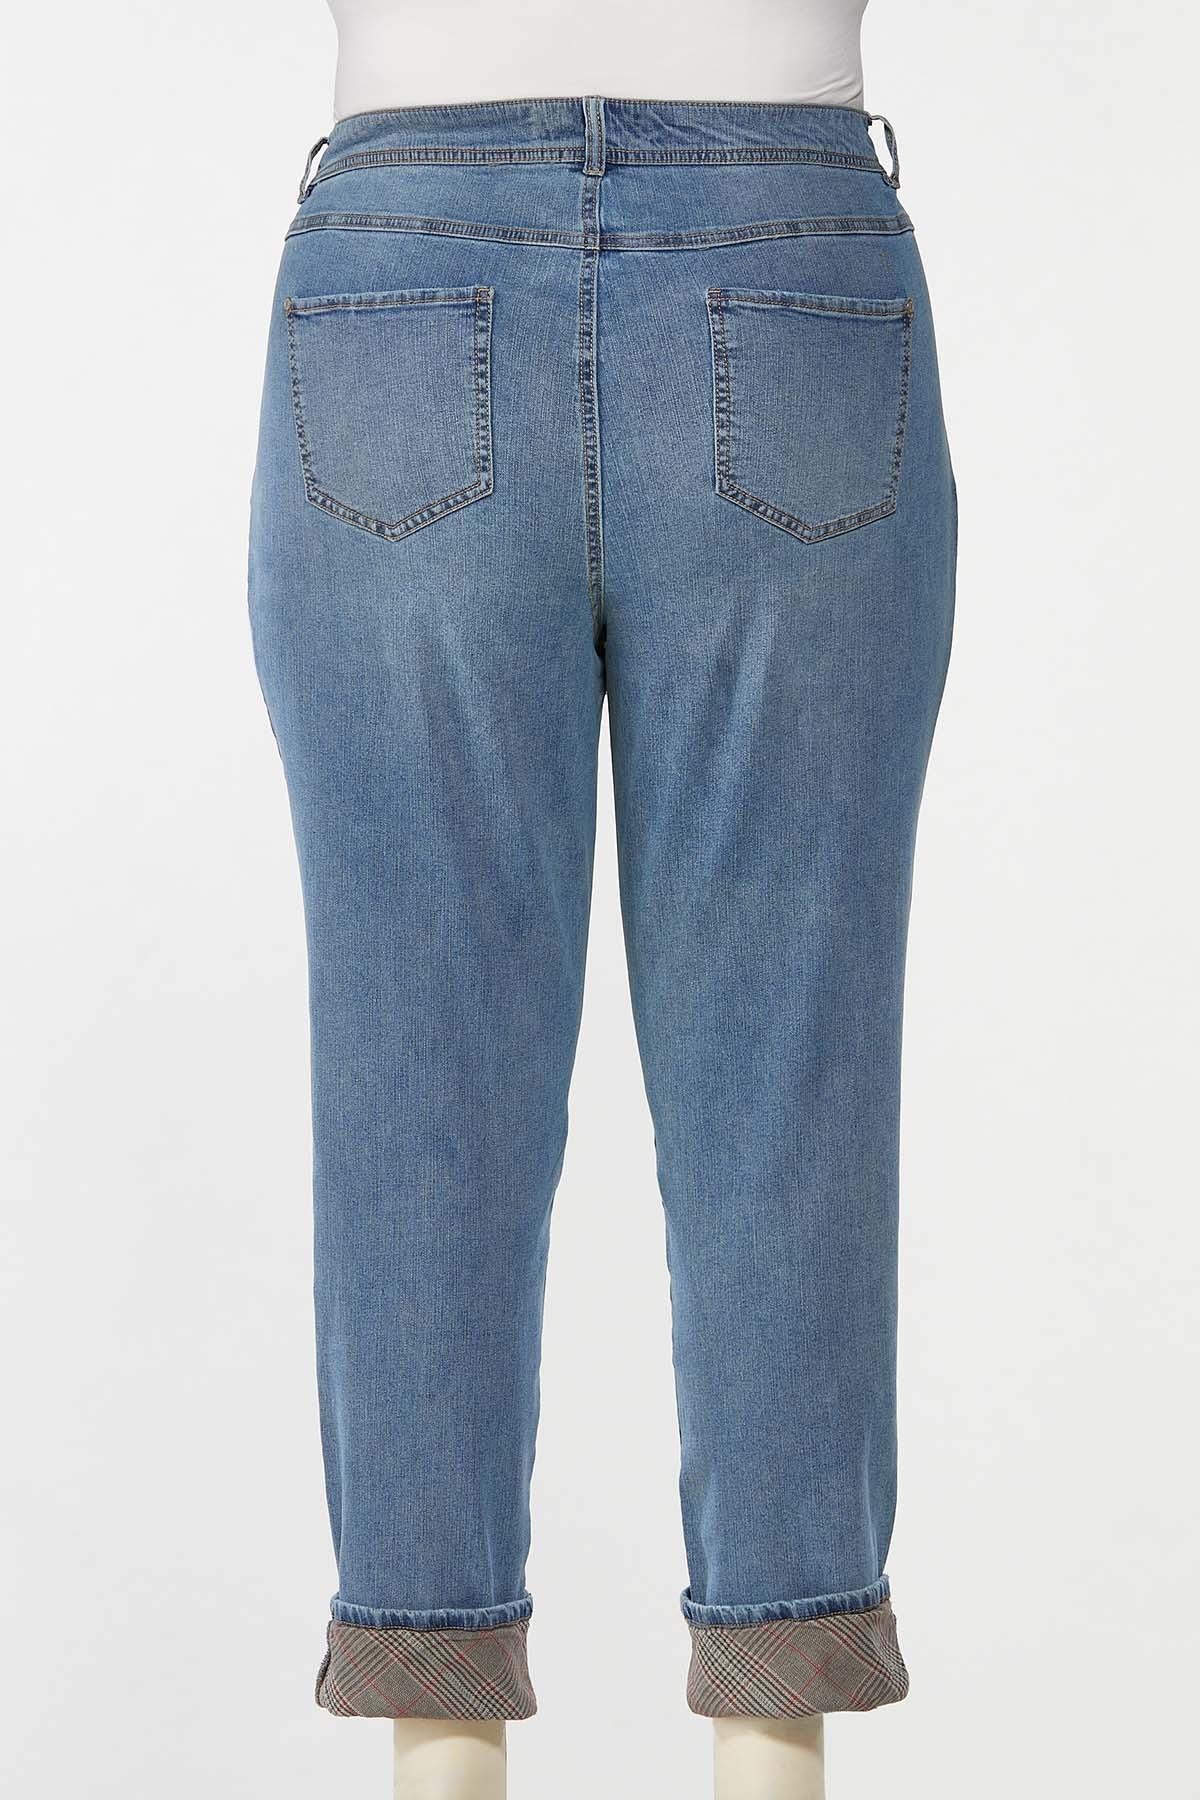 Plus Size Plaid Cuff Girlfriend Jeans (Item #44713536)